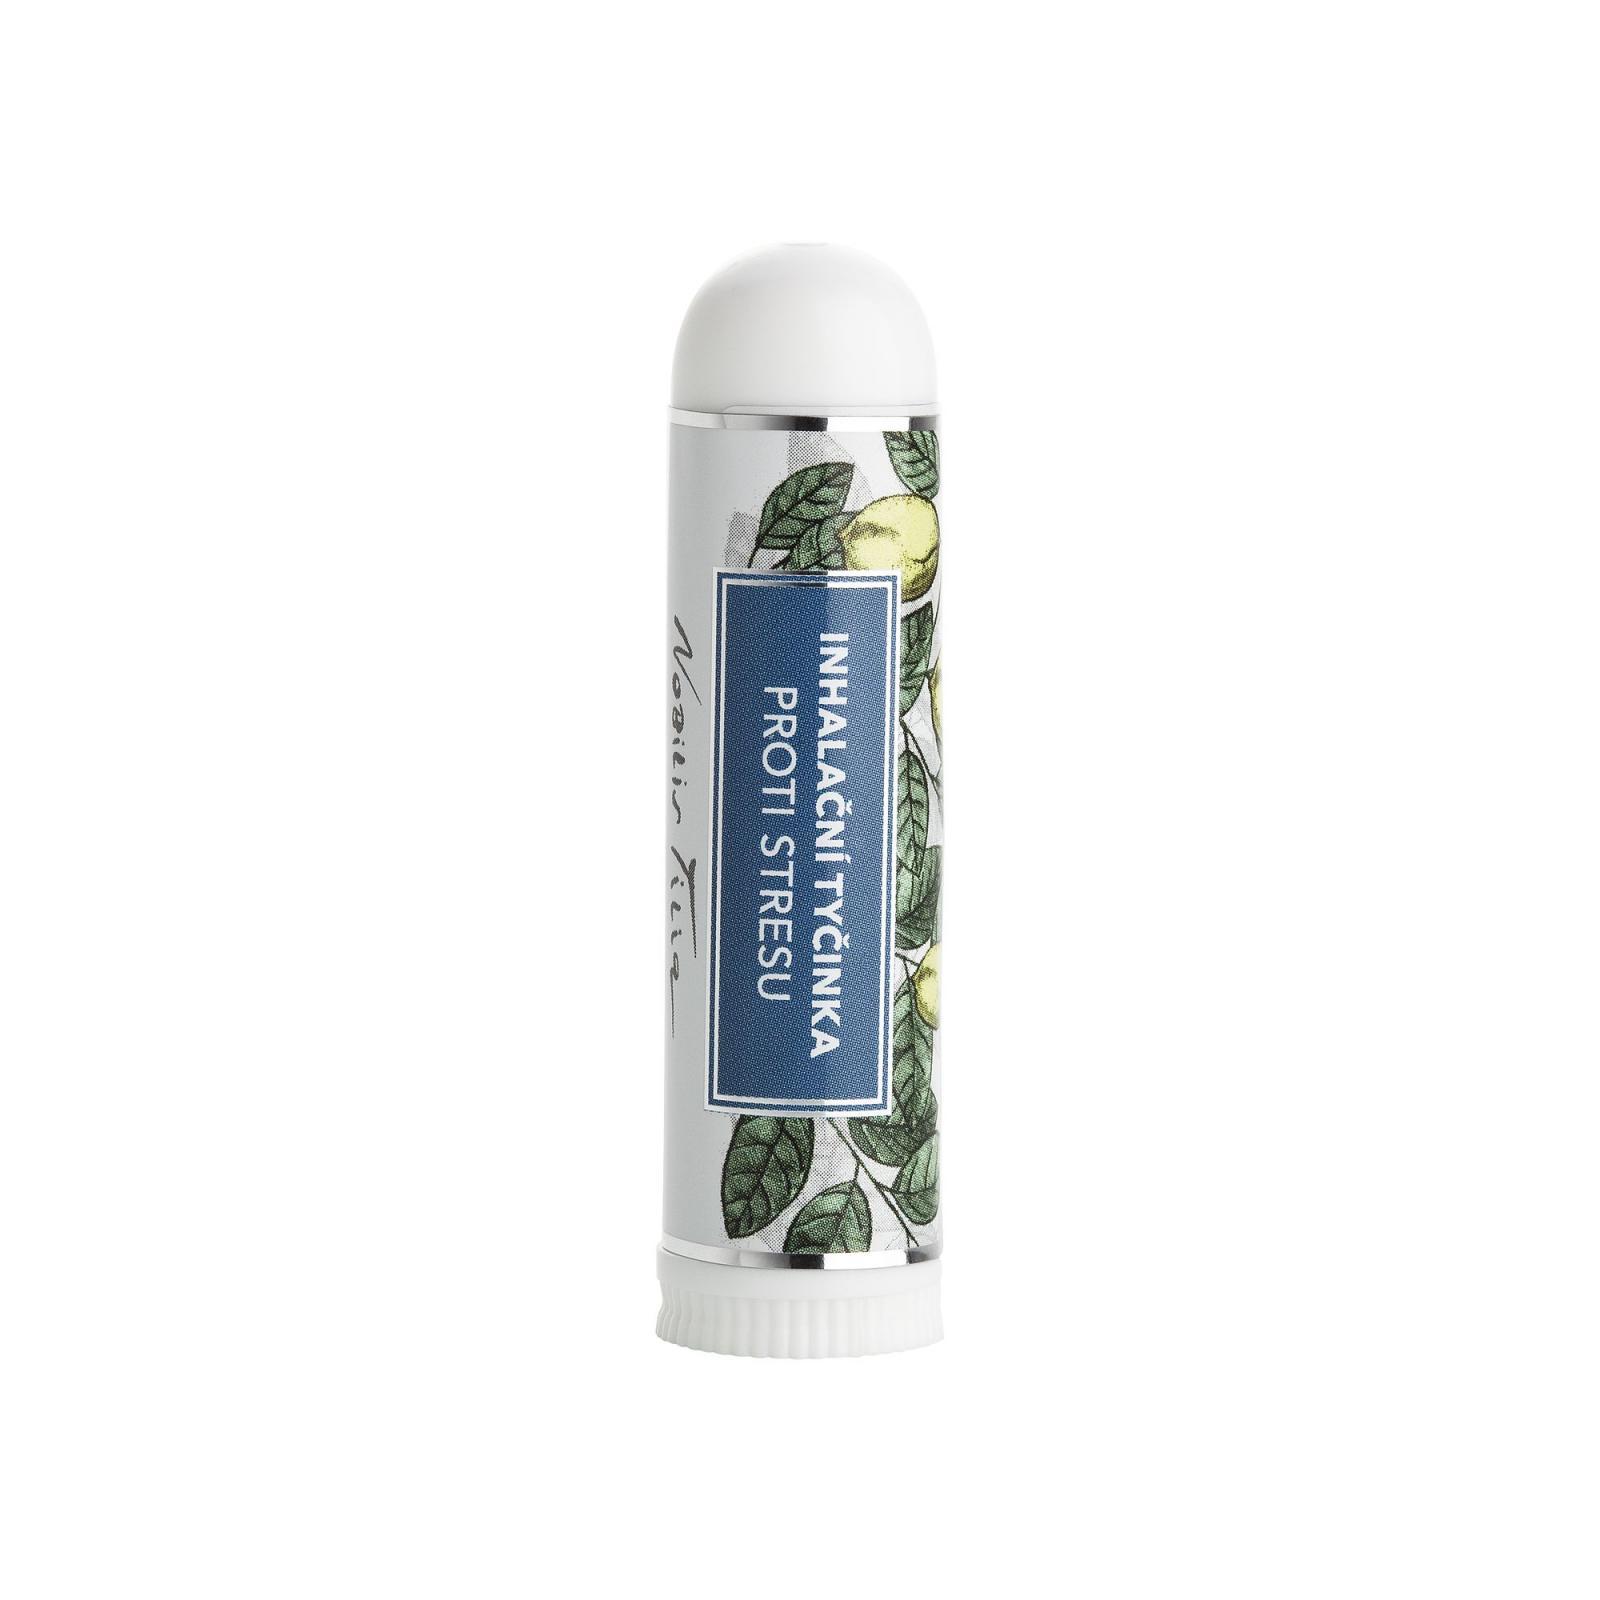 Nobilis Tilia Inhalační tyčinka proti stresu 1 ks